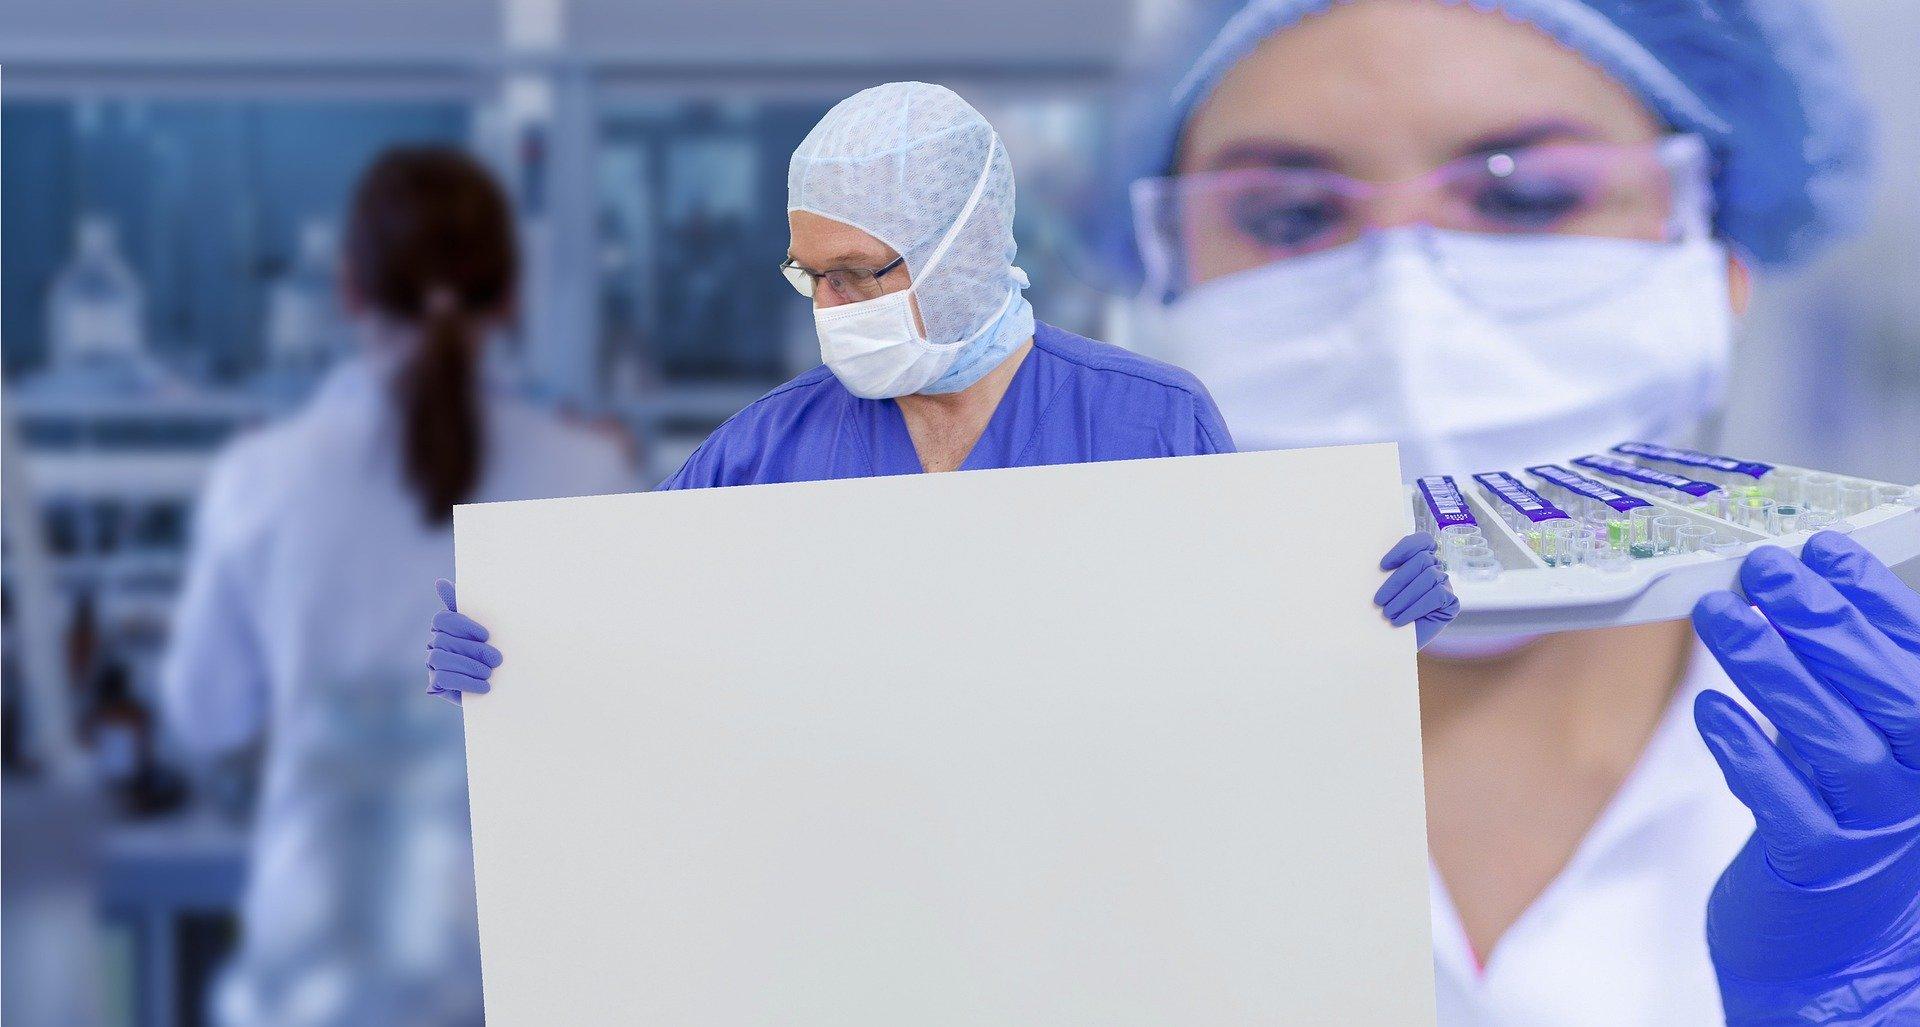 Covid-19: французские ученые заинтриговали новым препаратом против вируса.